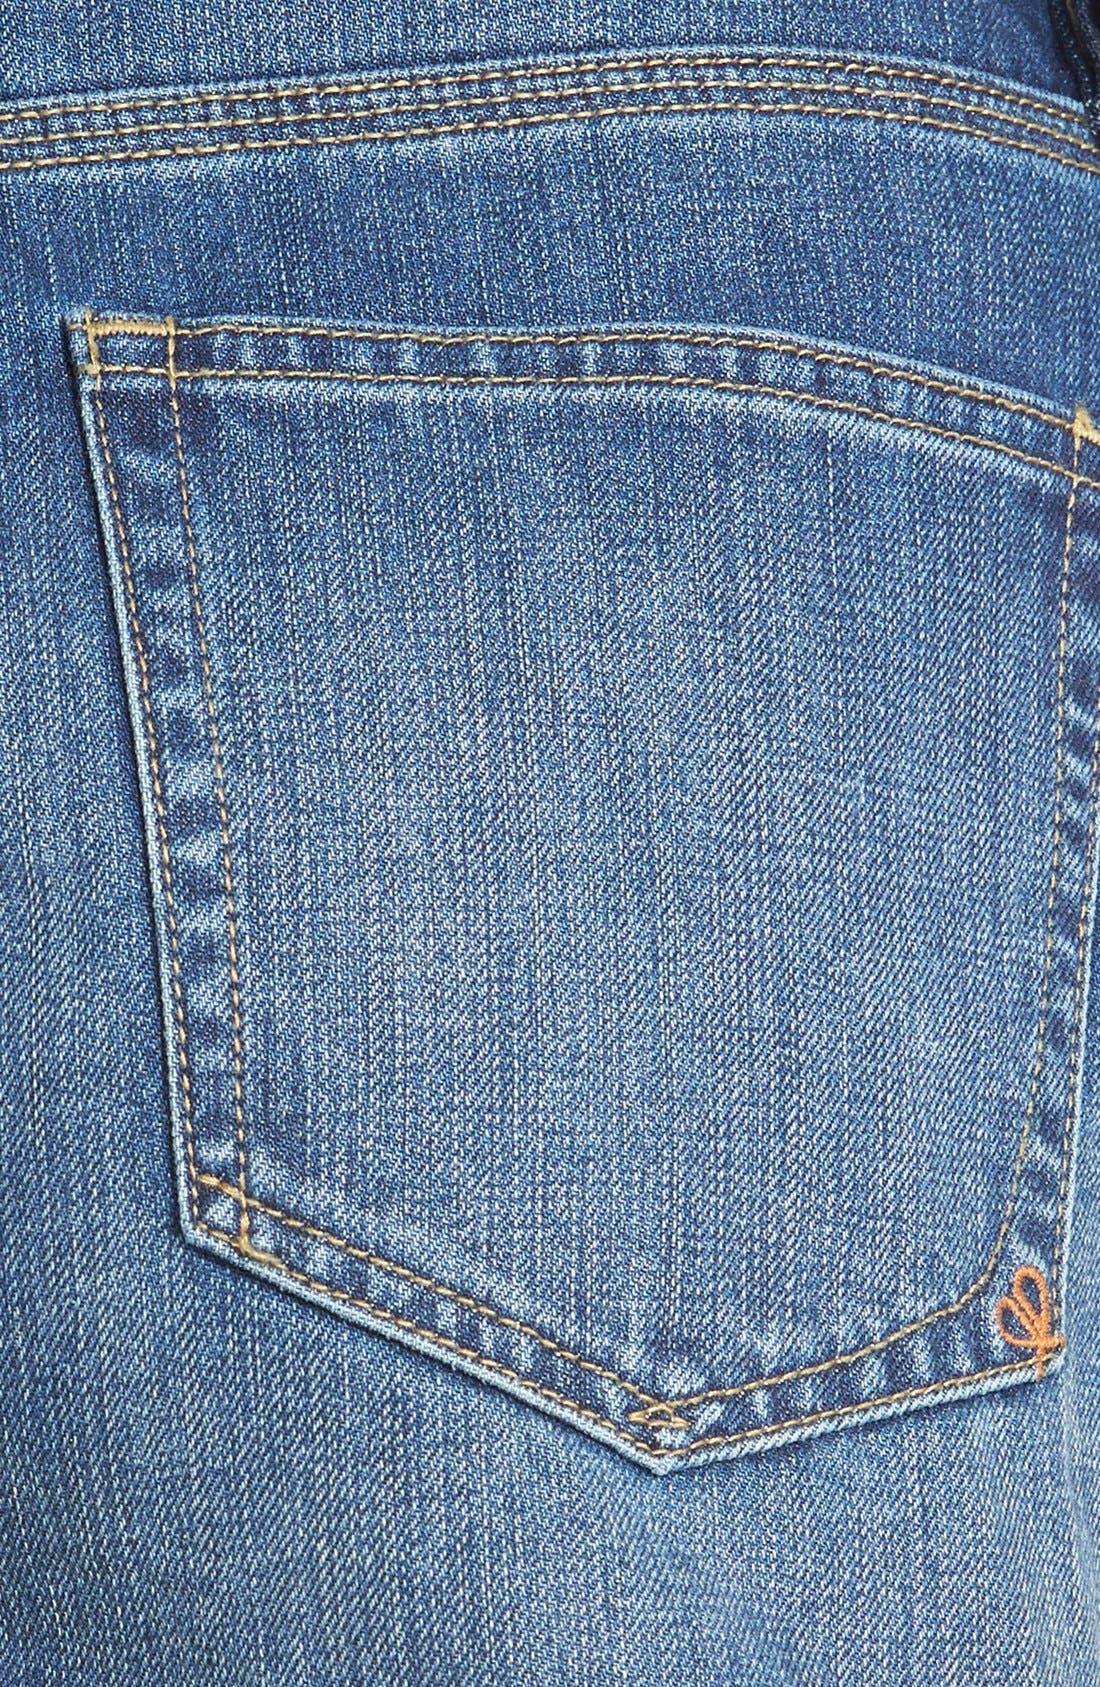 Alternate Image 4  - Dittos 'Kierra' Destroyed High Rise Denim Shorts (Medium Vintage)